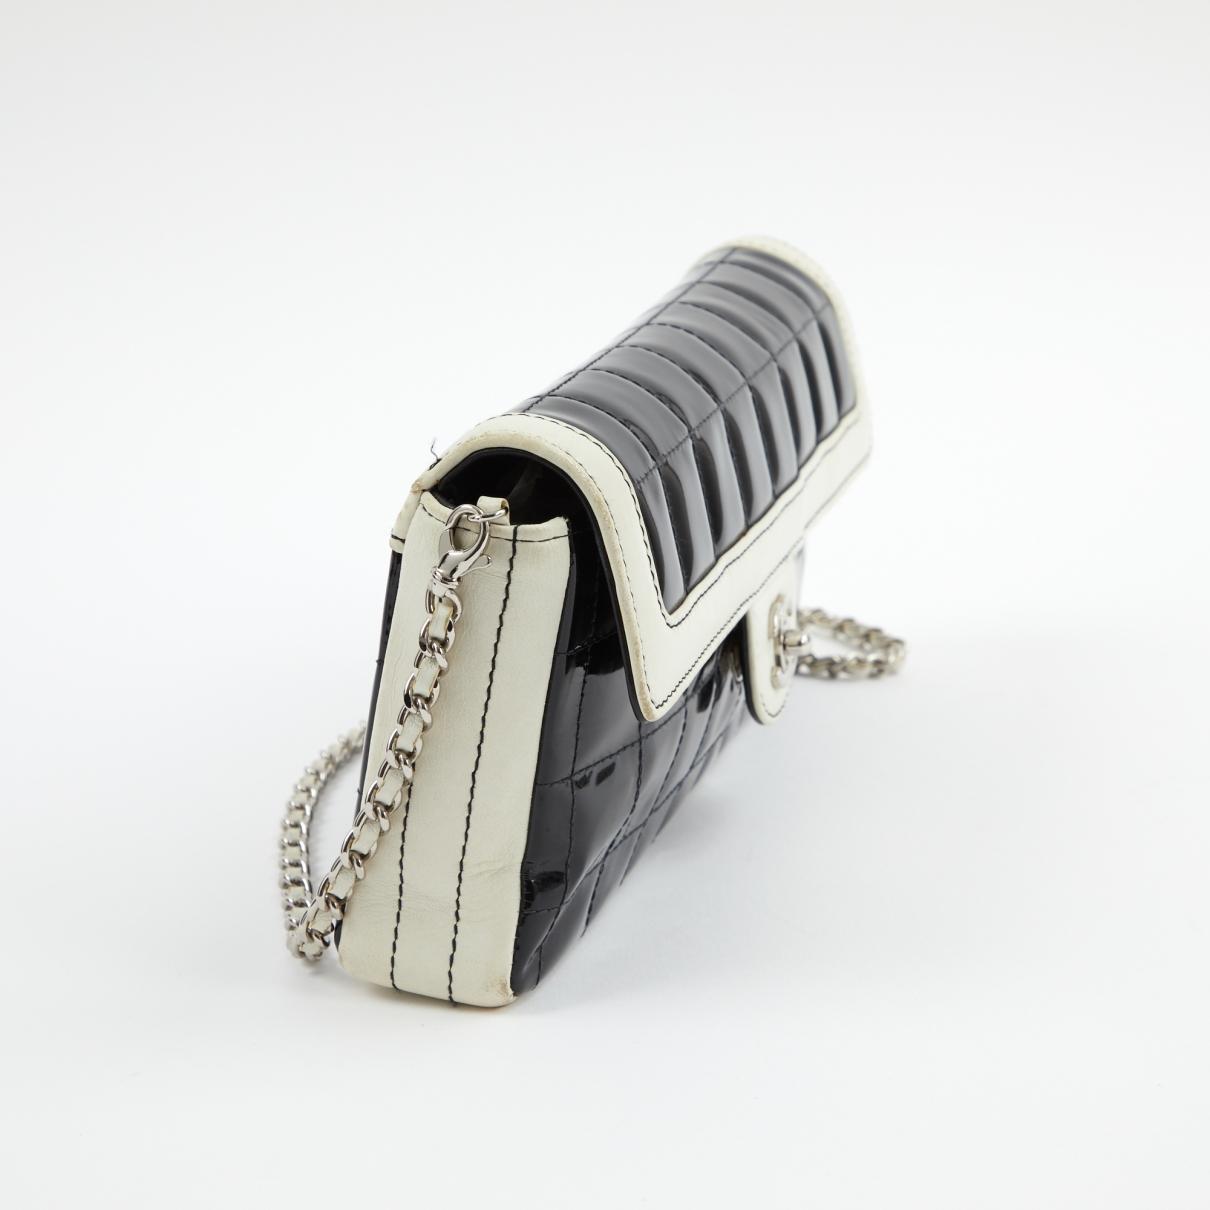 de4b16d4635b Chanel - Vintage East West Chocolate Bar Black Patent Leather Handbag -  Lyst. View fullscreen